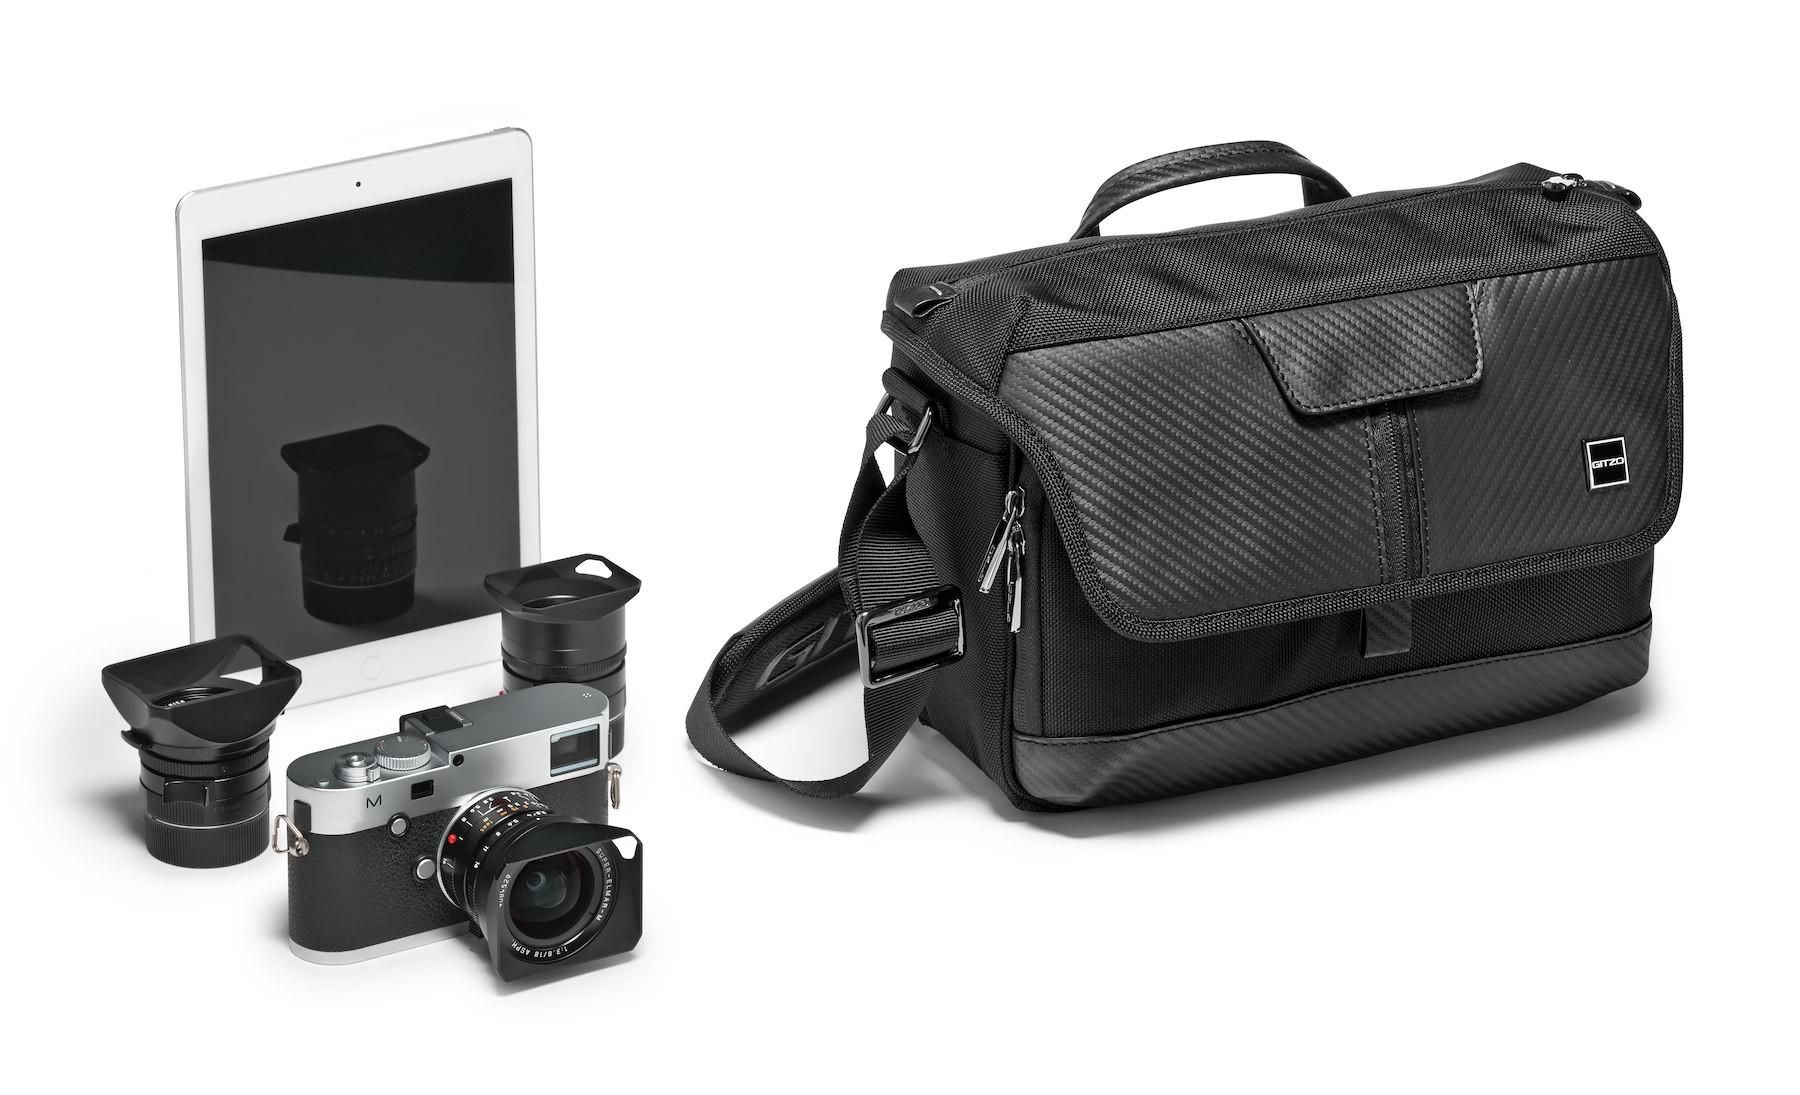 Gitzo Century compact camera m